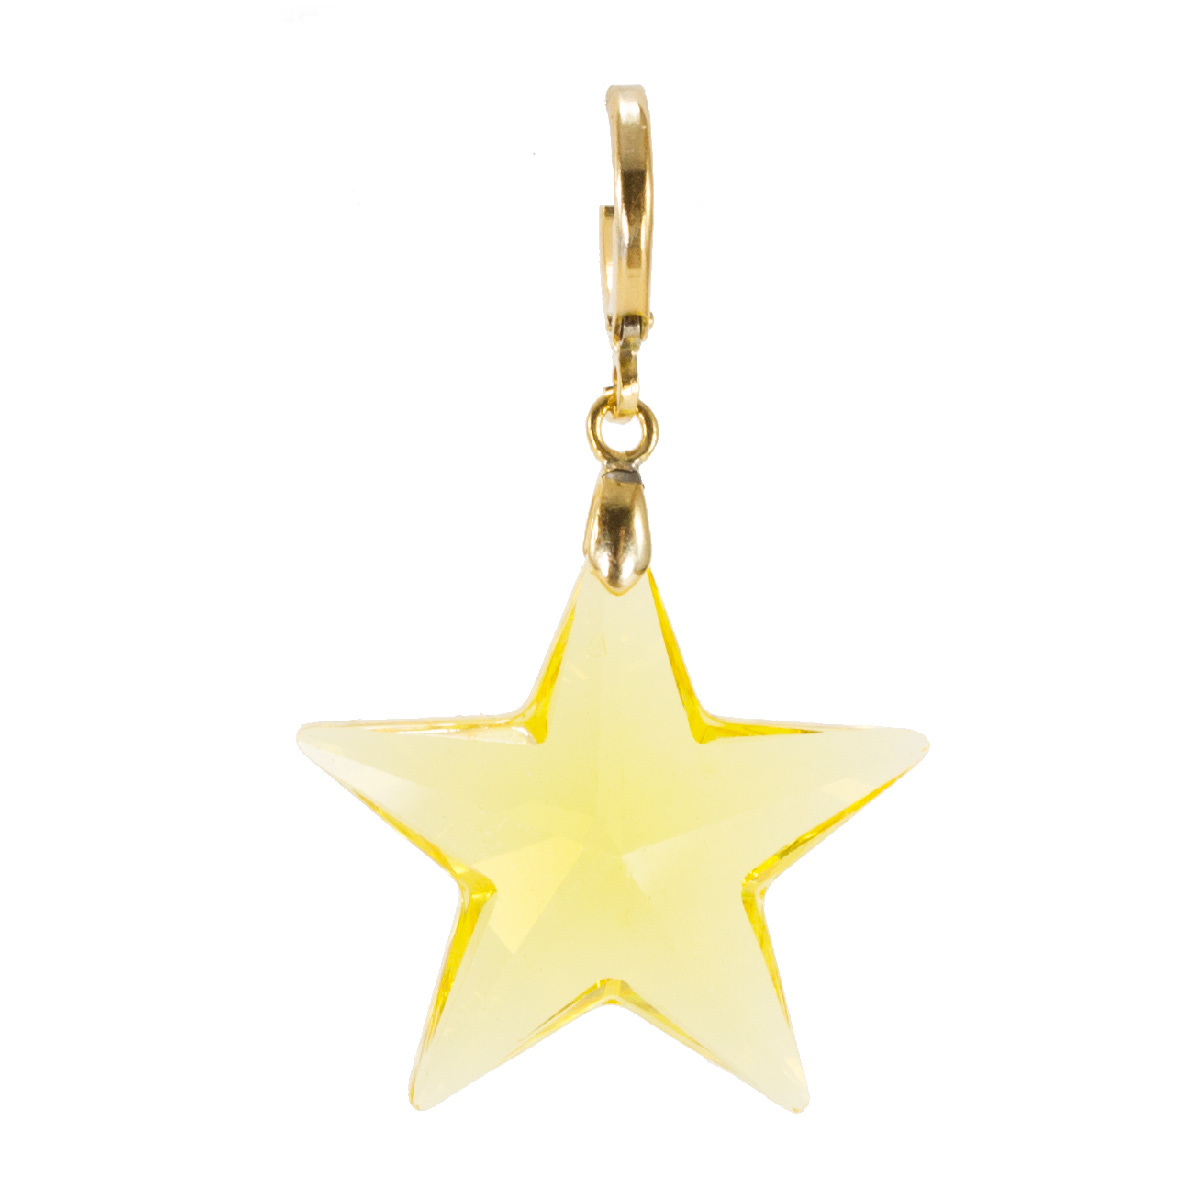 Brinco estrela Swaroviski